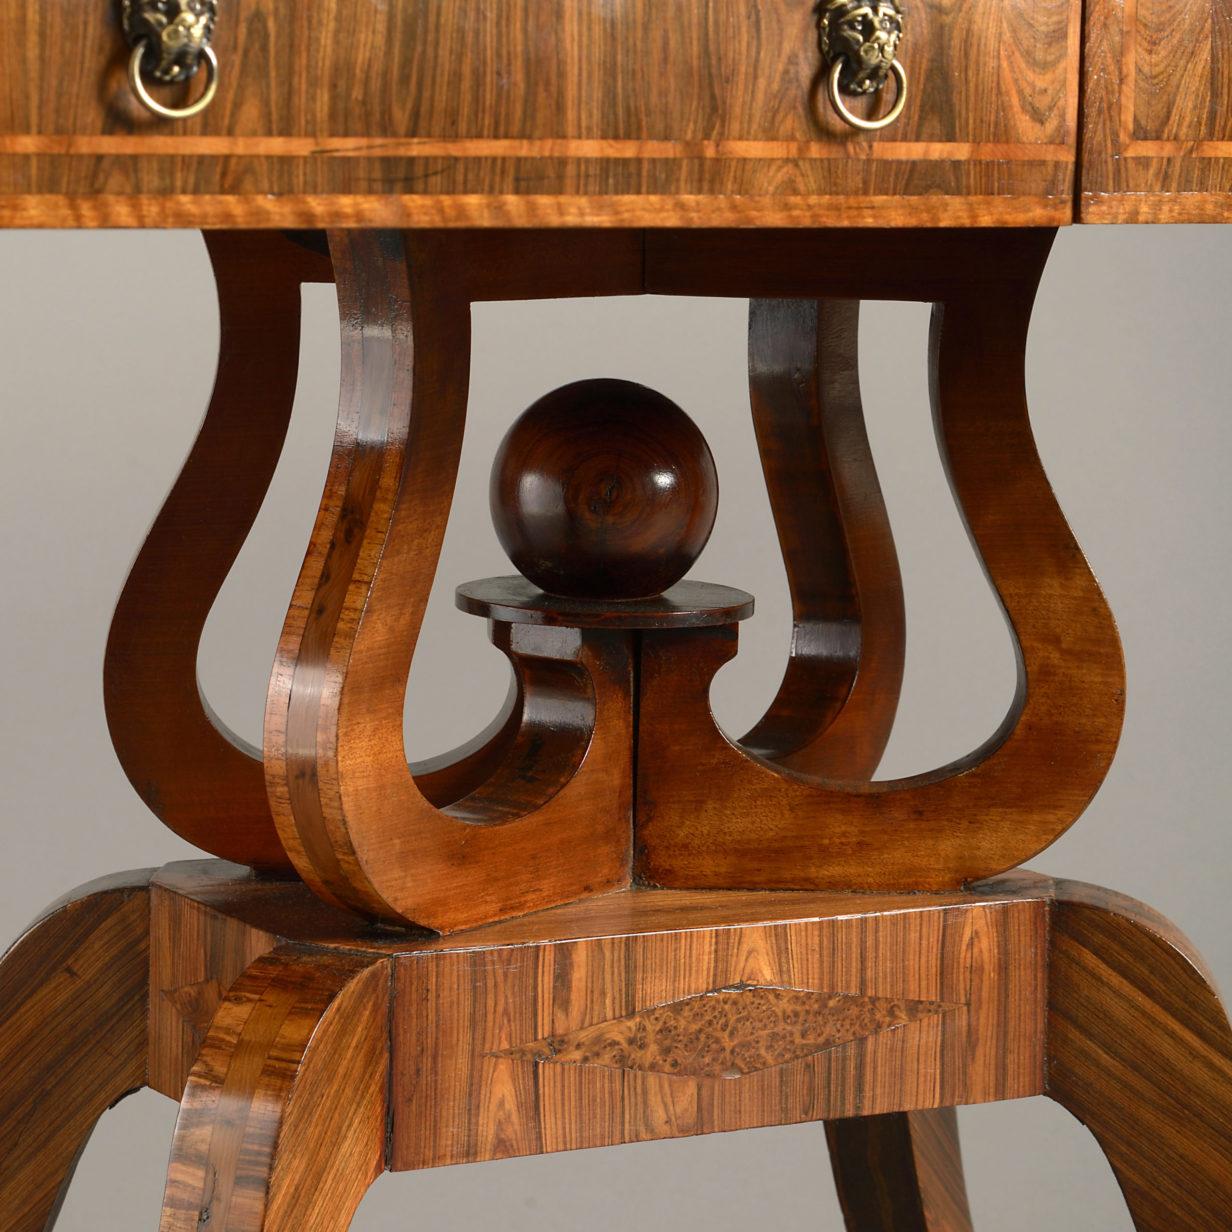 A Regency Period Sofa Table